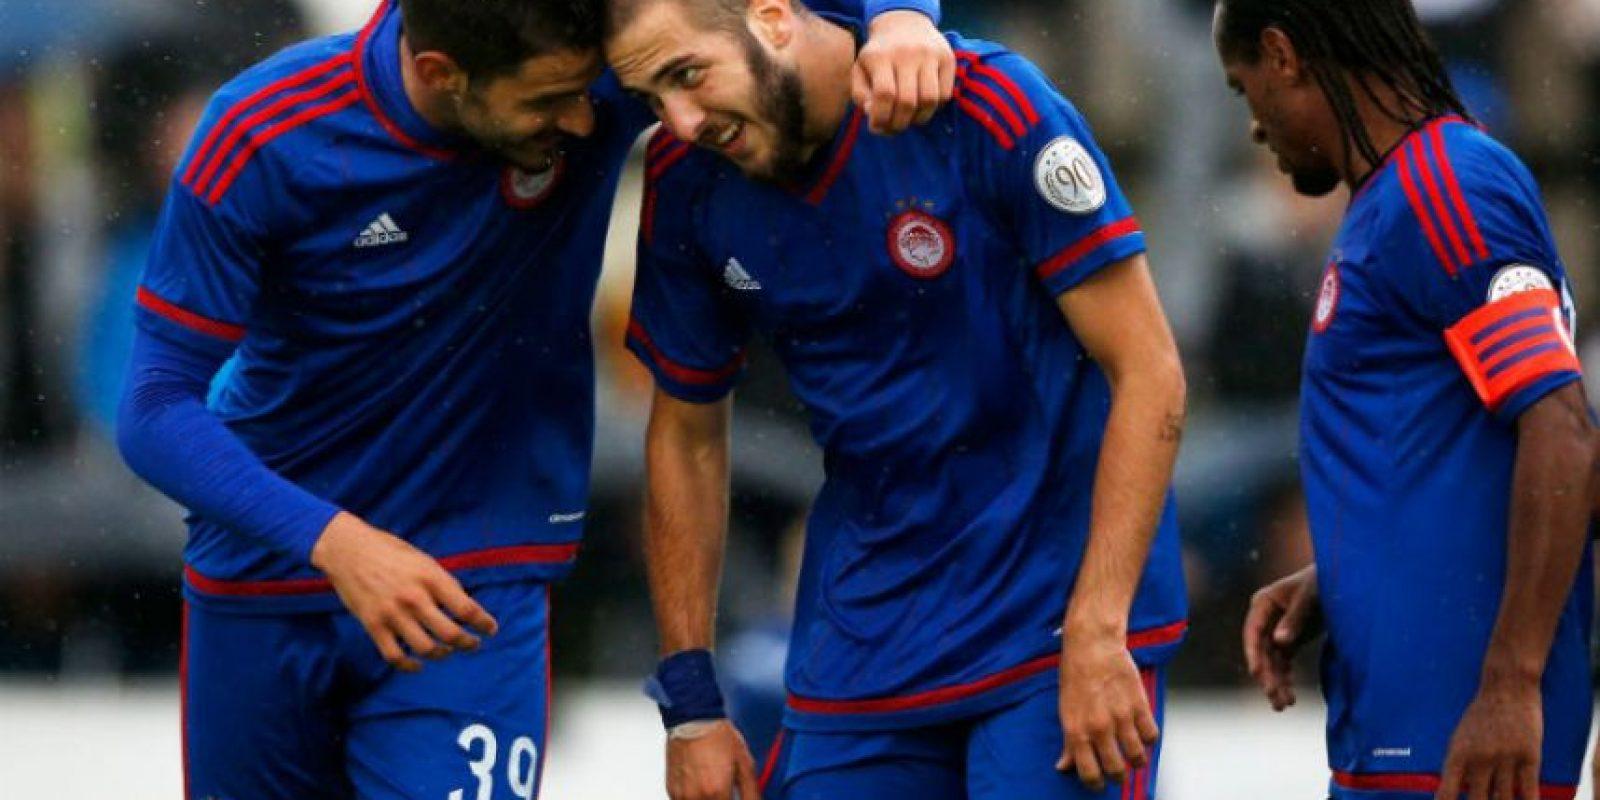 Olympiakos (Grecia) Foto:Getty Images